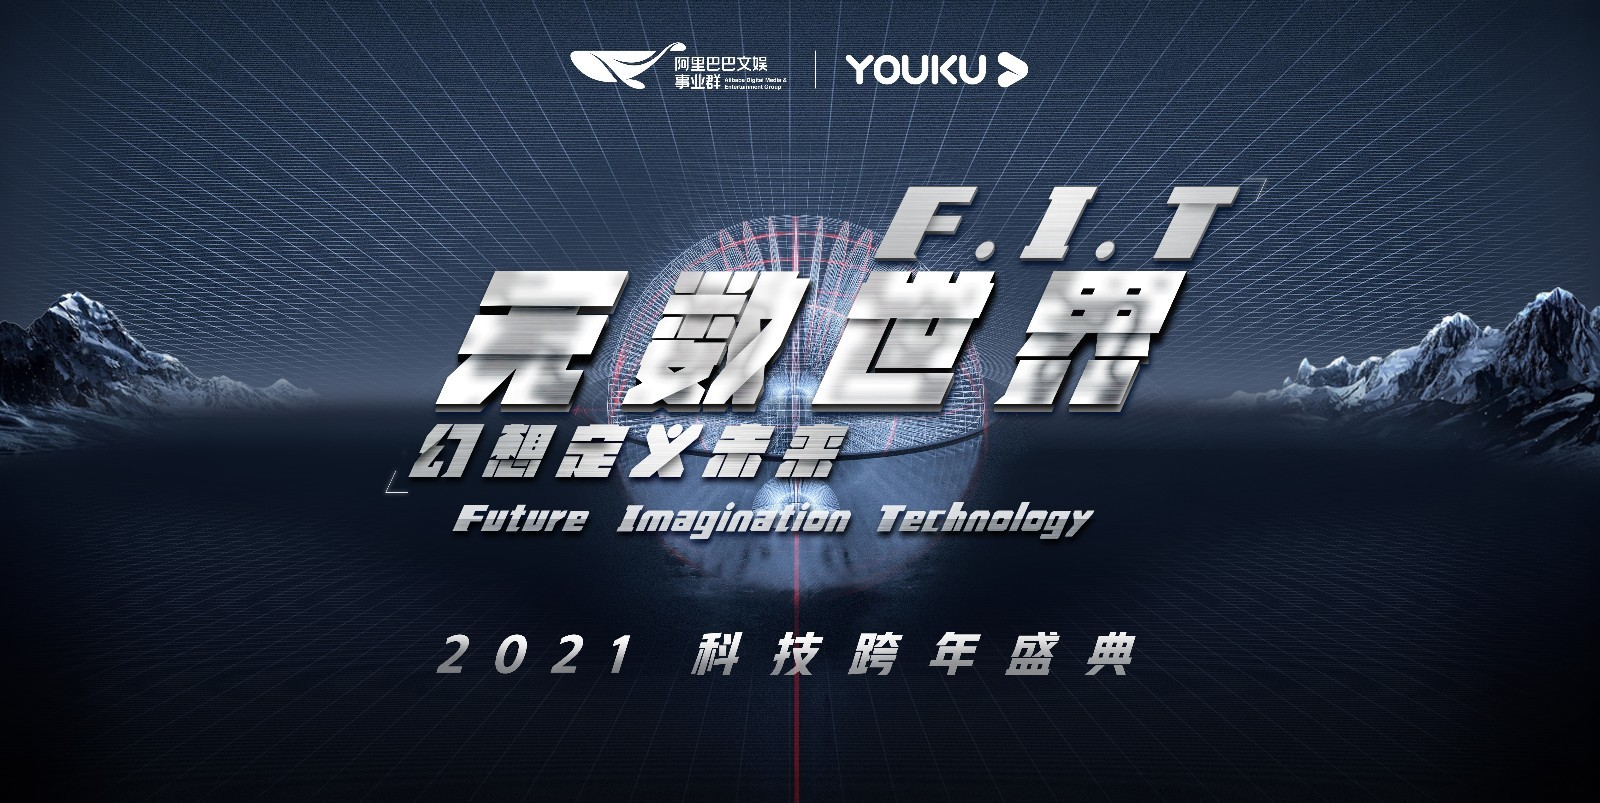 usdt无需实名交易(caibao.it):《F.I.T无数天下》科技跨年盛典引热议 科幻大秀界说跨年新方式 第6张